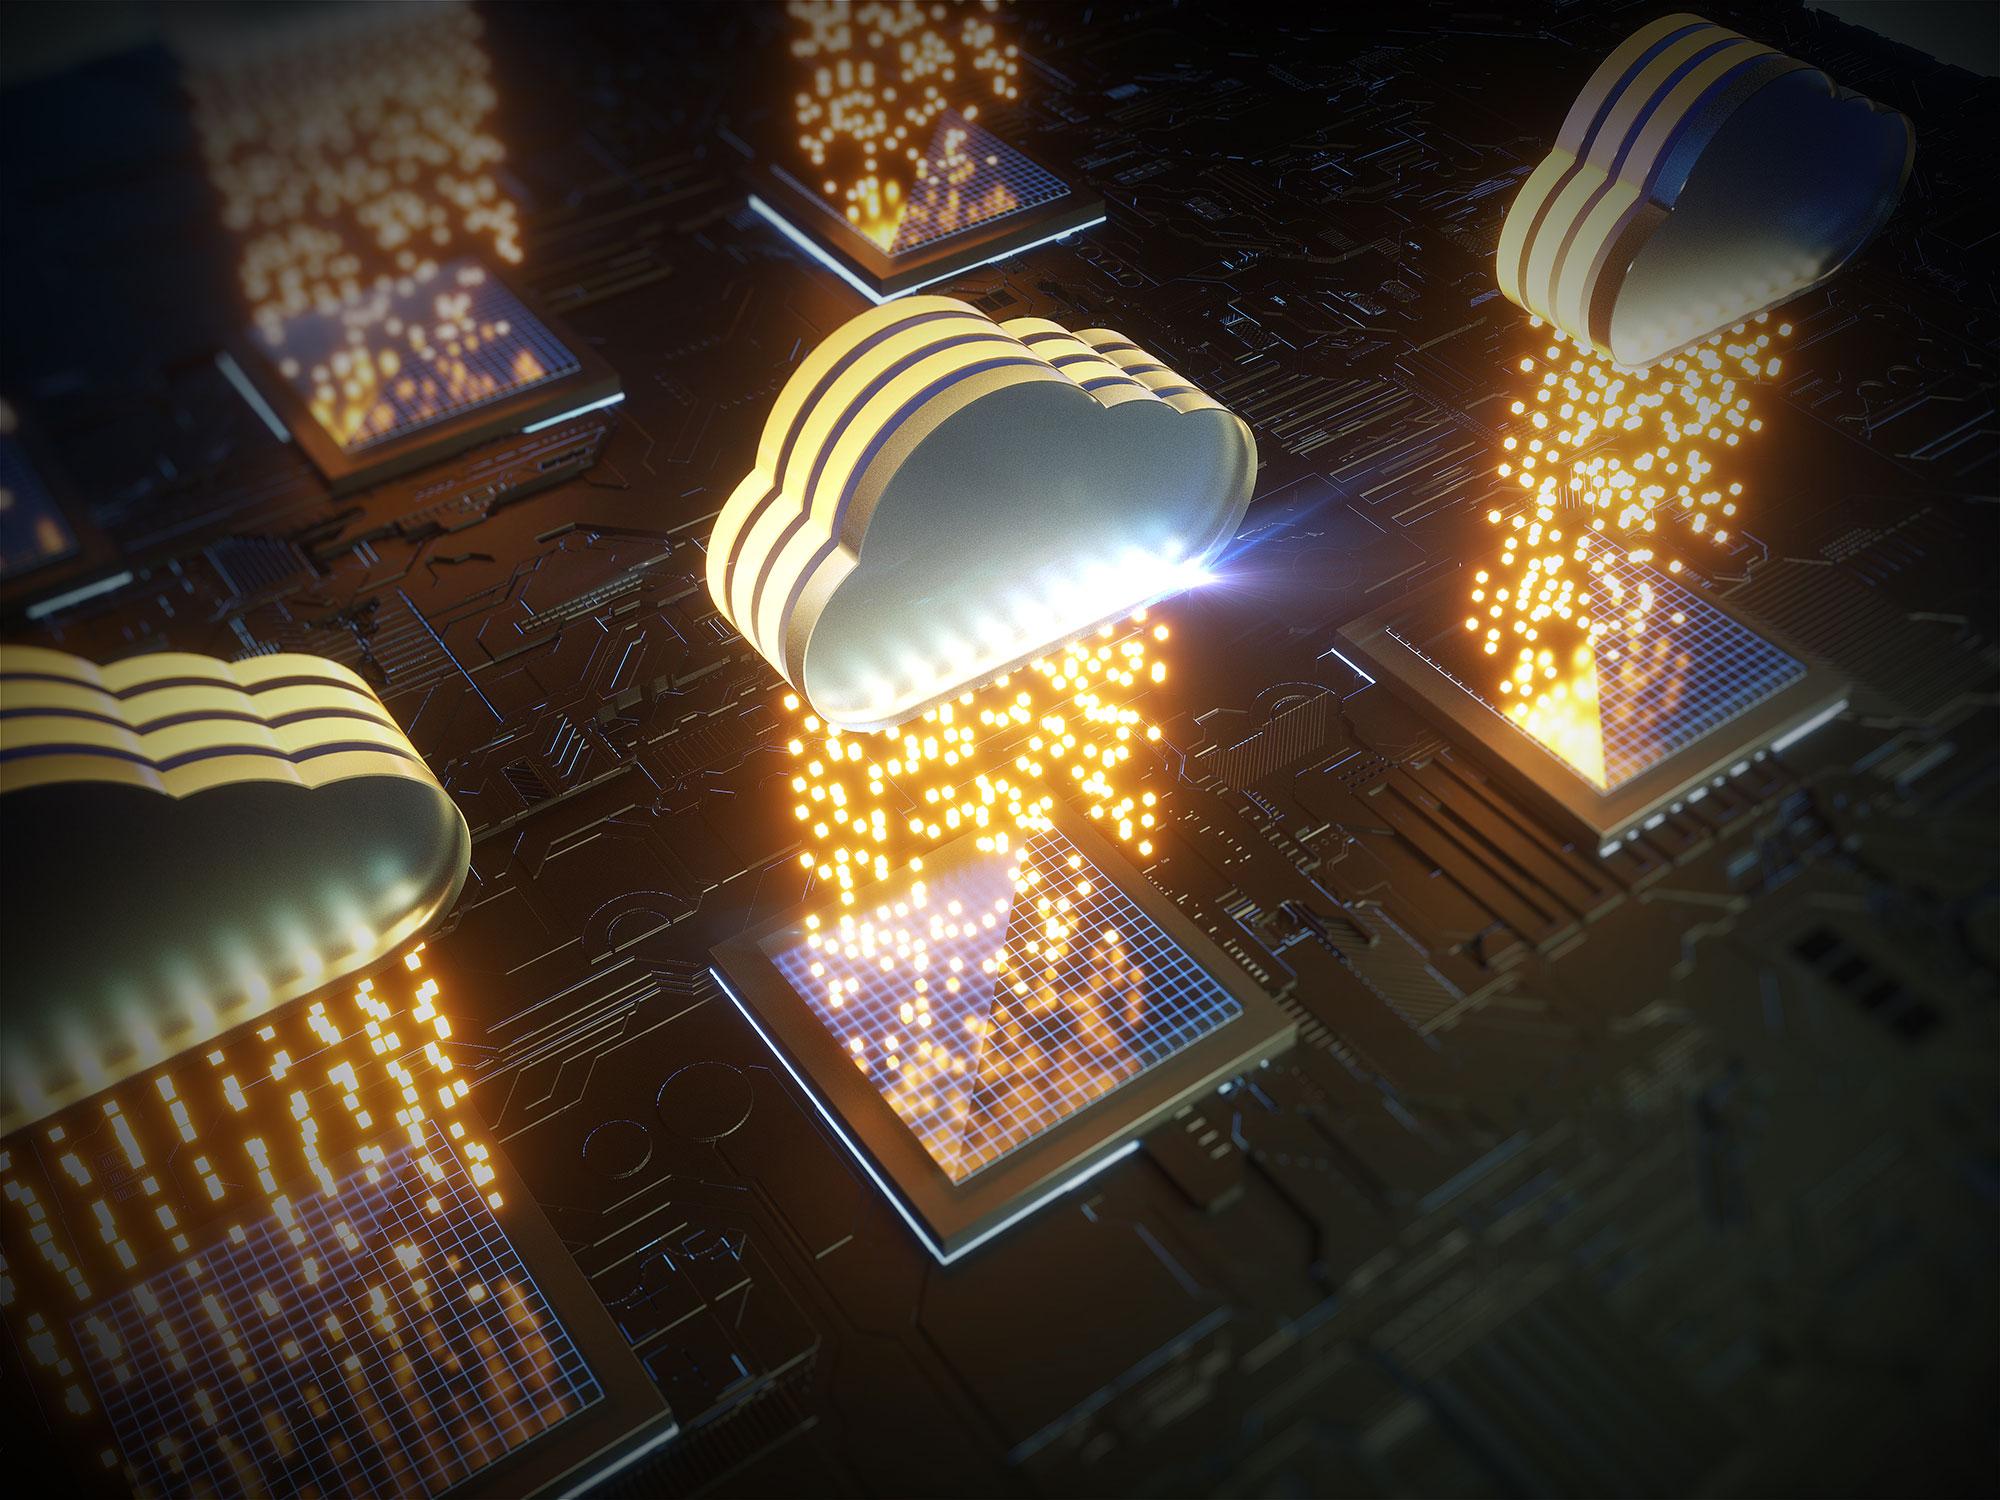 cloud-computing-rain-light-on-silicon-chips-circuit-board